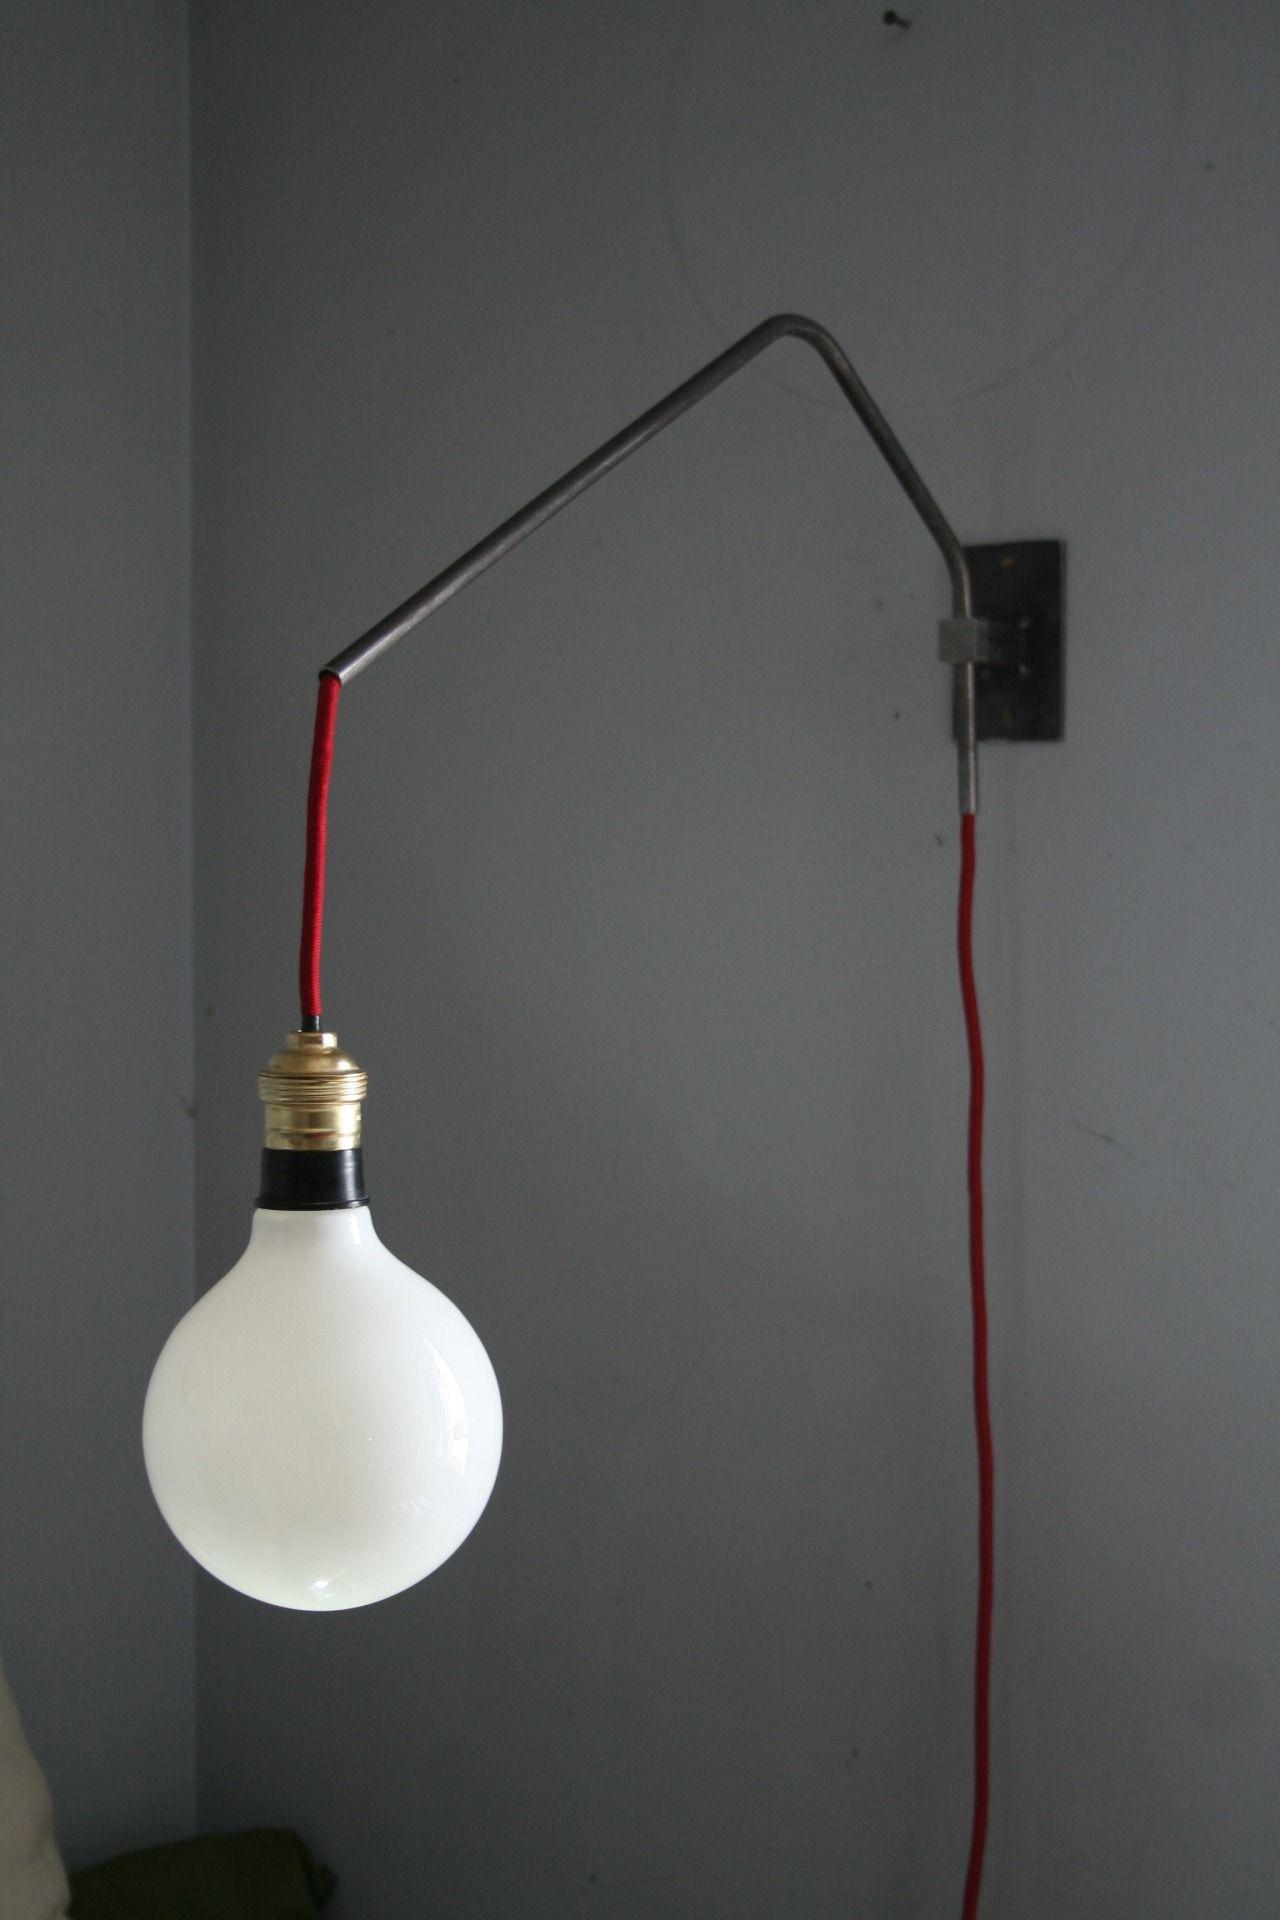 Super nU ' Lampe en applique metal brut inspiration Loft / Atelier 50's  GE08